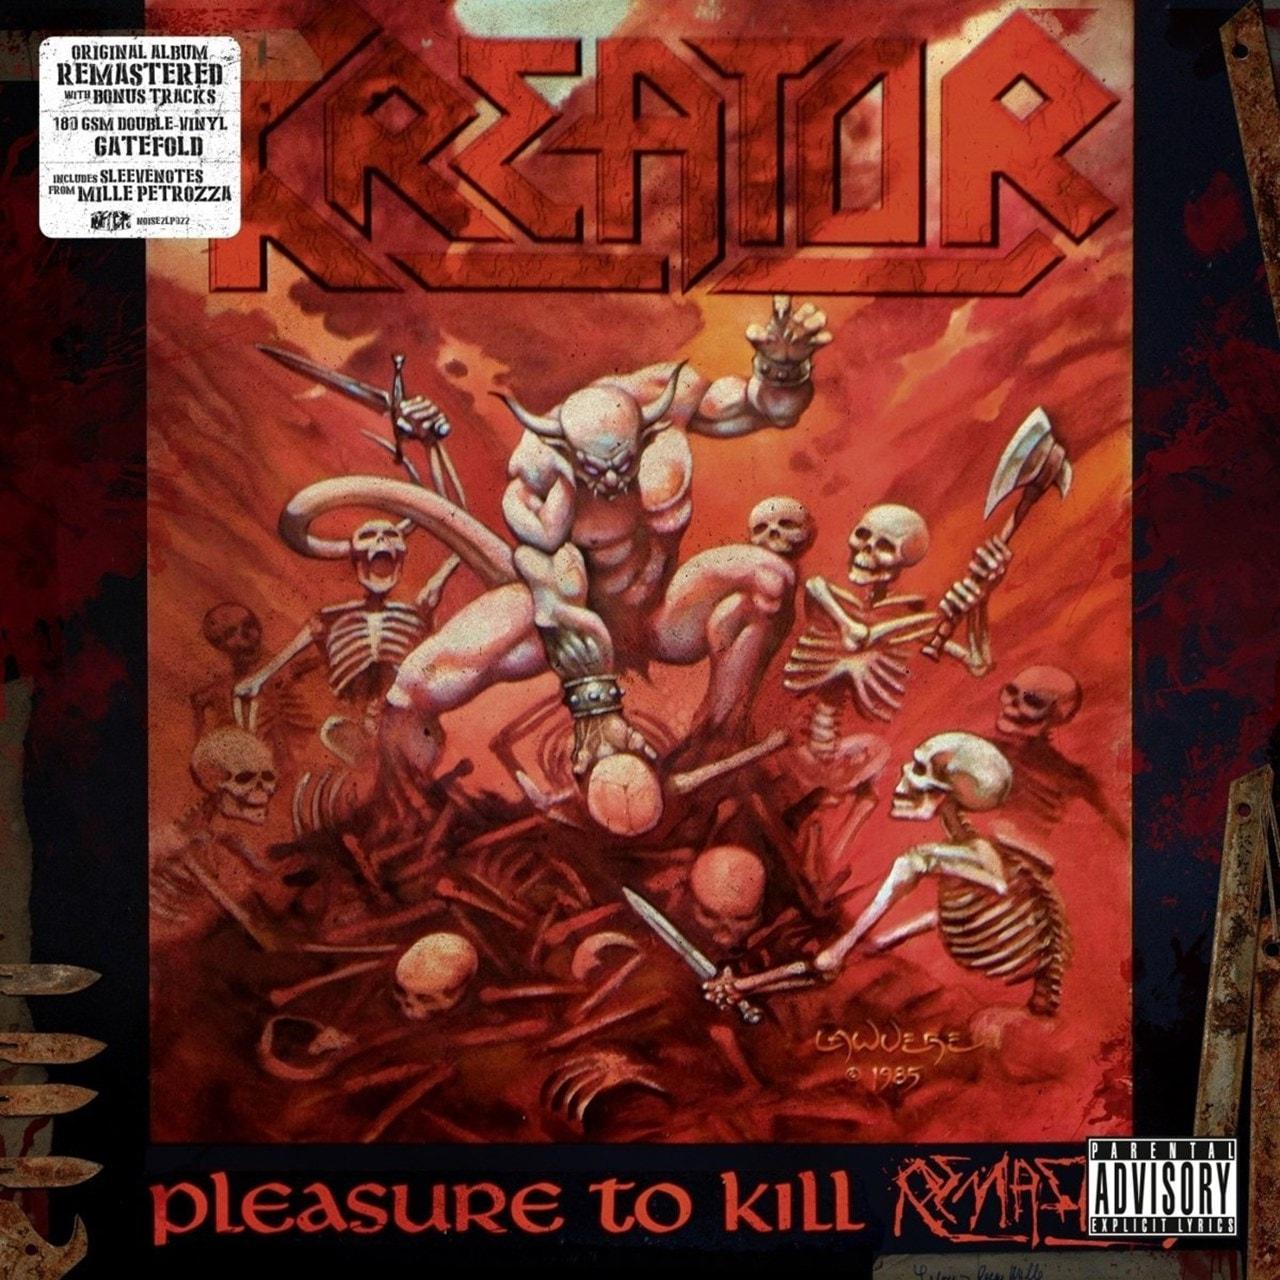 Pleasure to Kill - 1